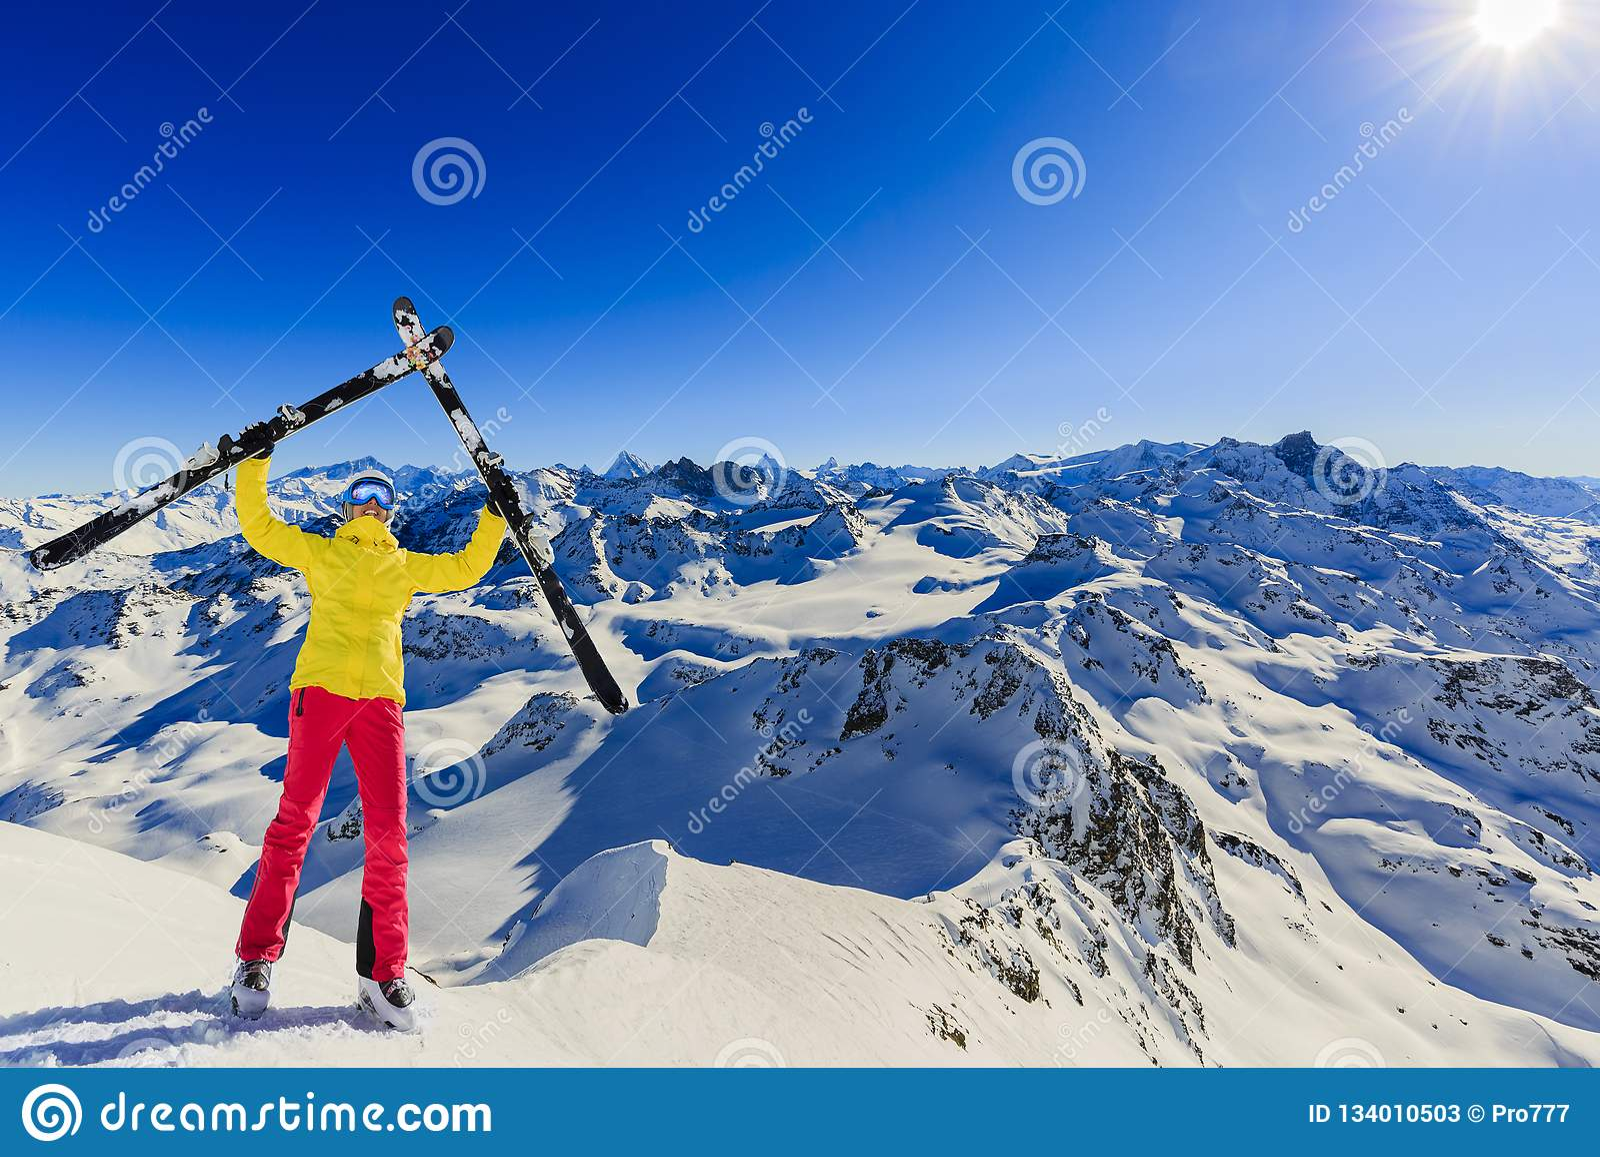 Ski in wintertijd, bergen en ski die backcountry equi reizen